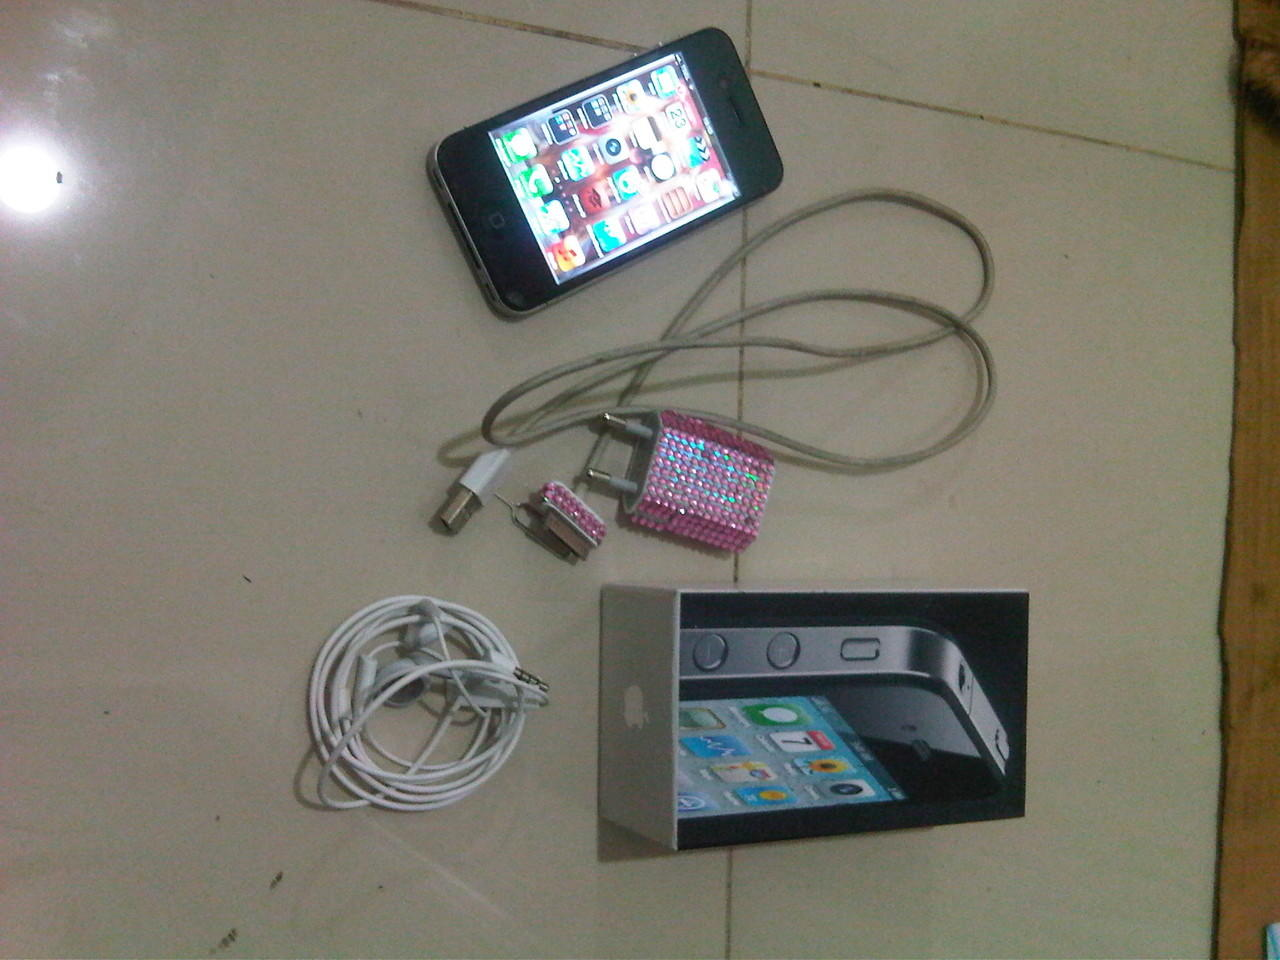 JUAL IPHONE 4G BLACK 16GB FU ex Wanita :)